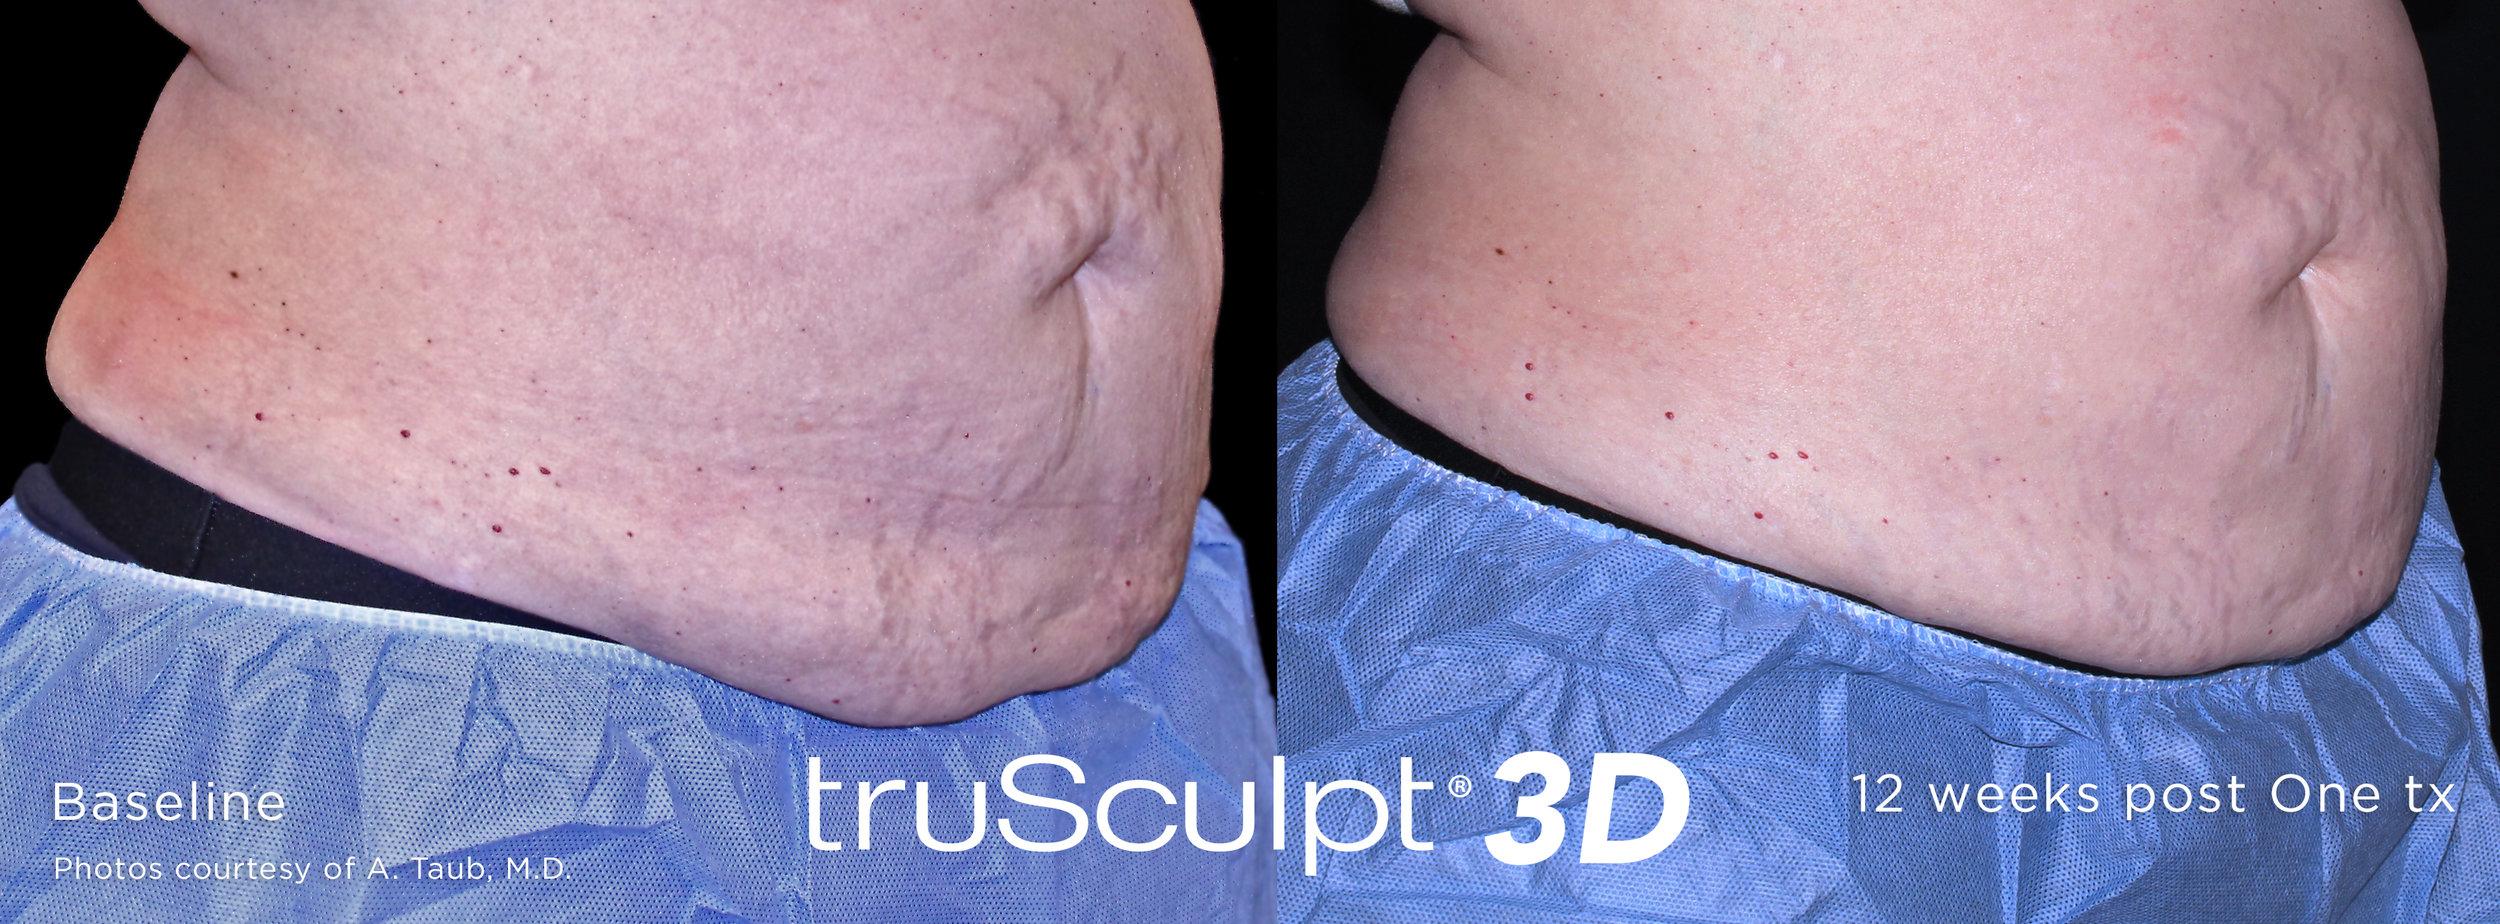 truSculpt-3D-B-A-Image-3 (1).jpg